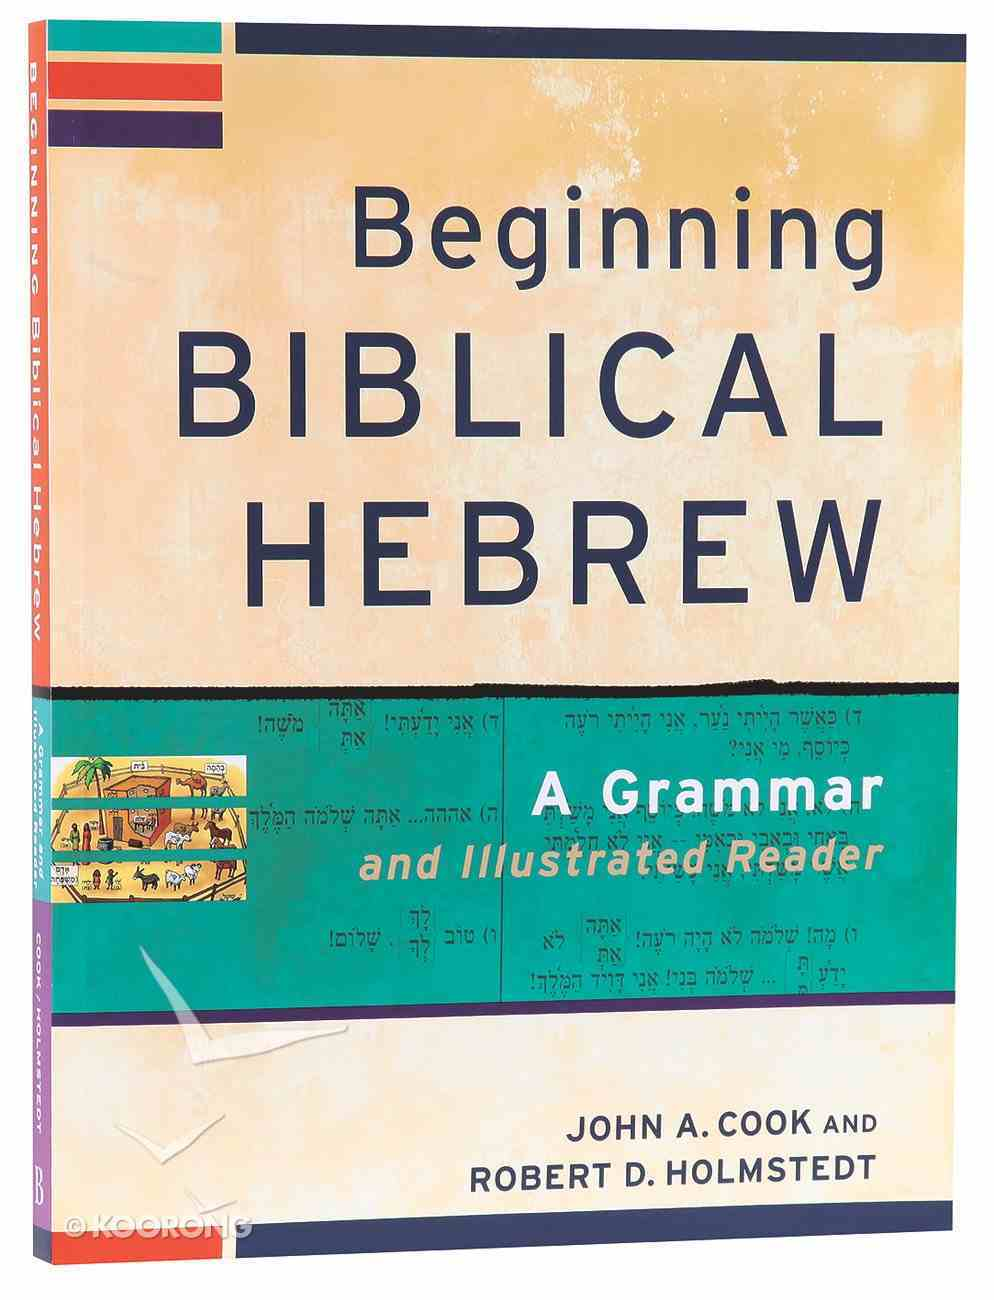 Beginning Biblical Hebrew: A Grammar and Illustrated Reader Paperback